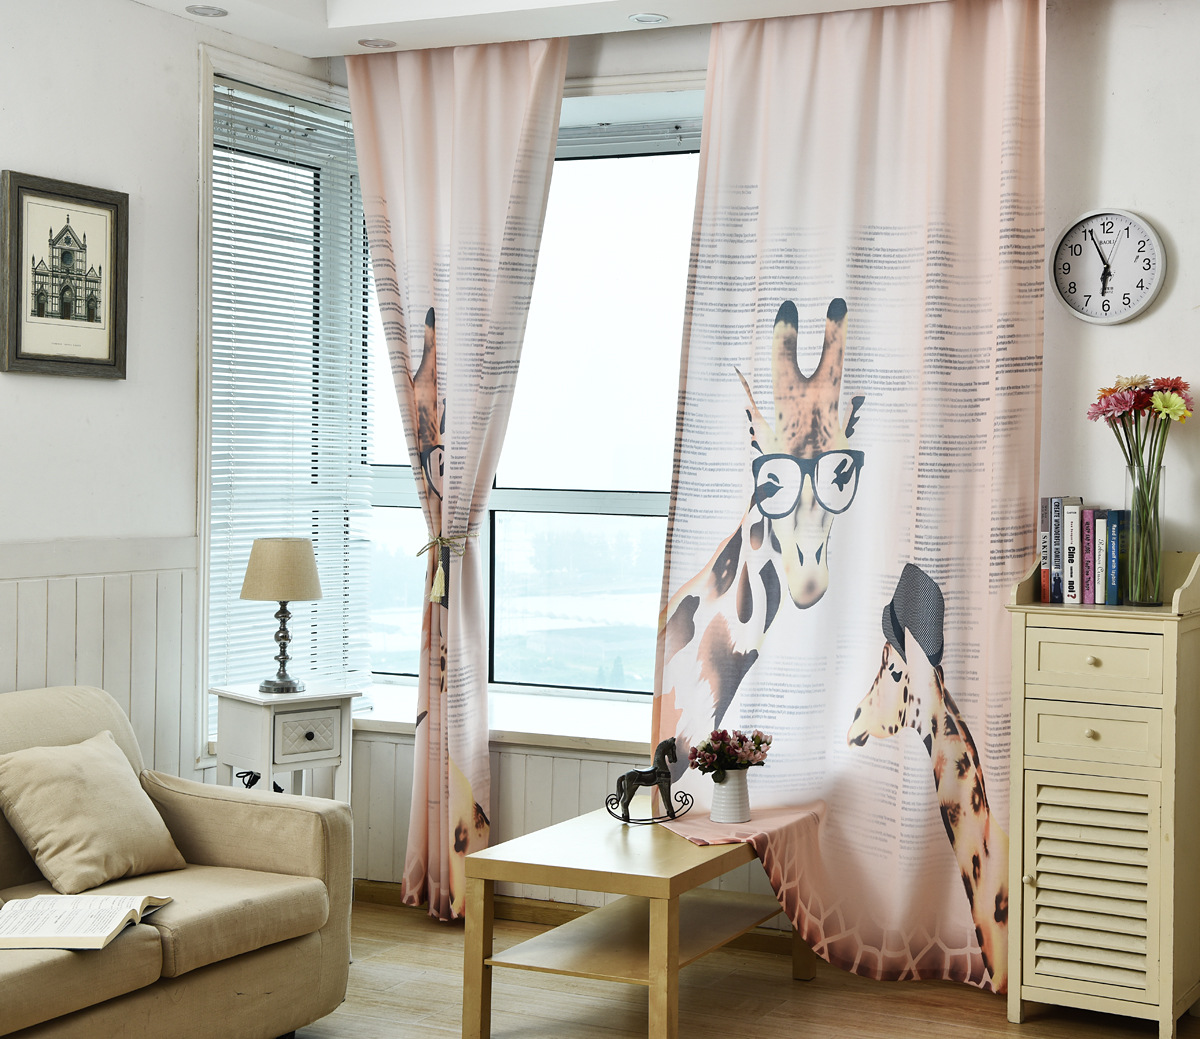 Korean Rural Curtains for Living Room Bedroom Custom Digital Giraffe Zebra Curtain Small Fresh Living Room Study Curtain Fabric